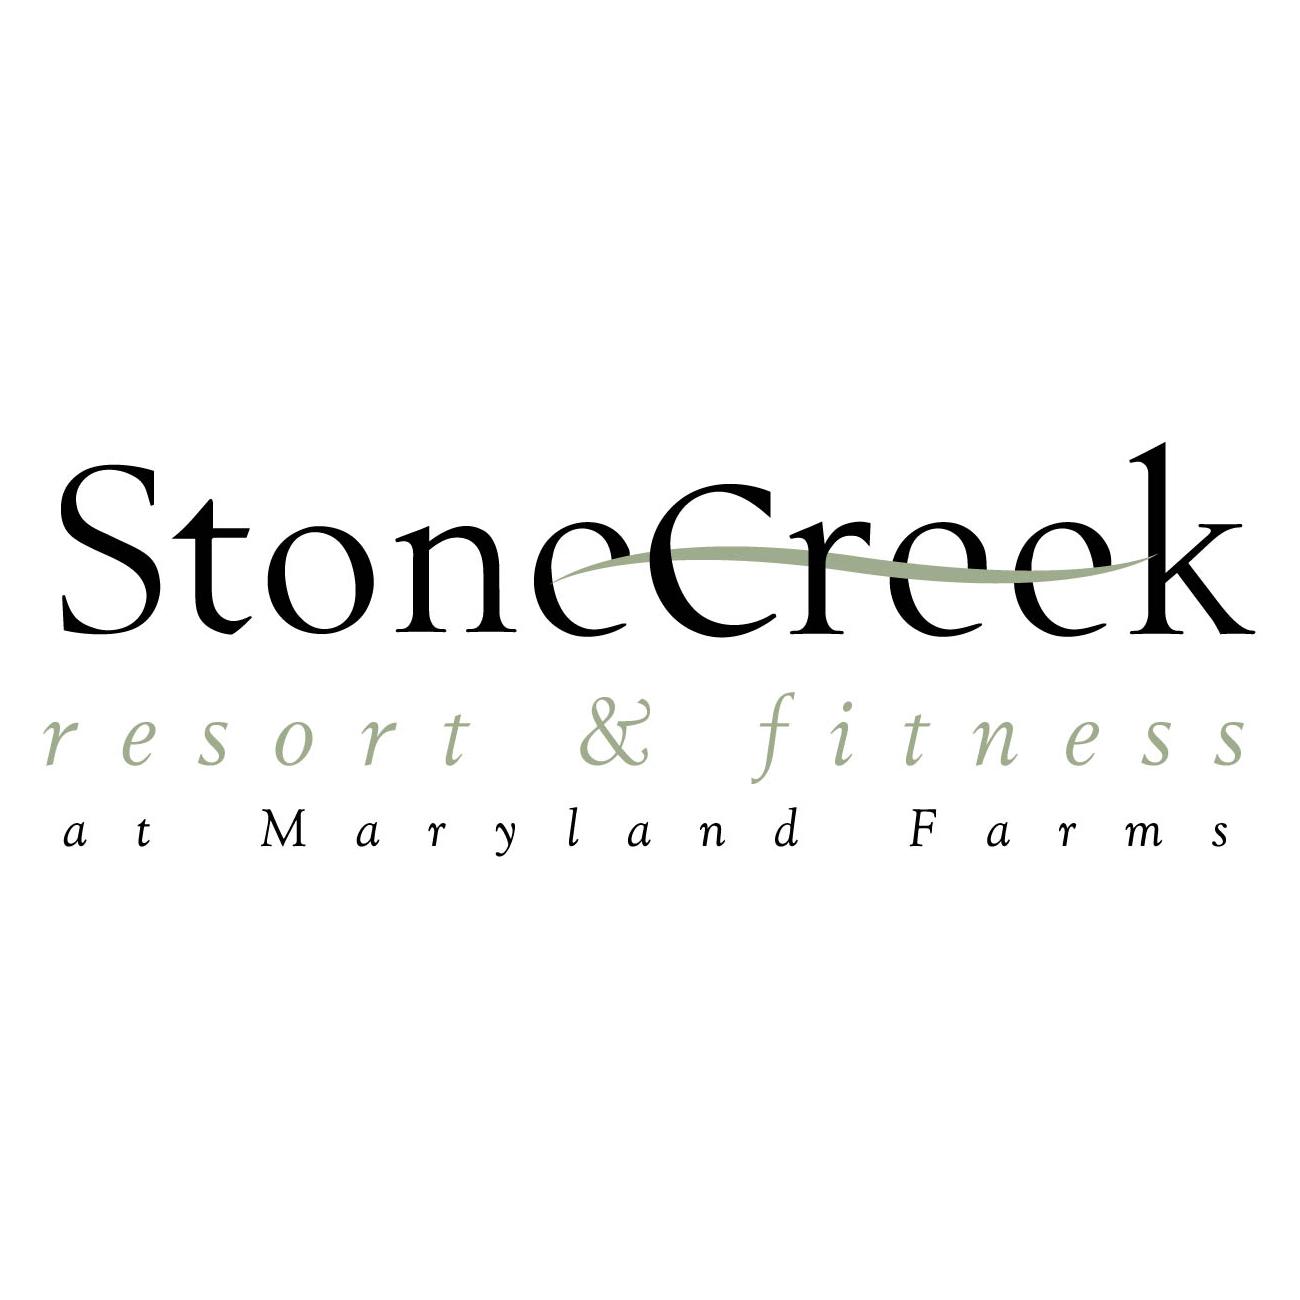 StoneCreek logo.jpg